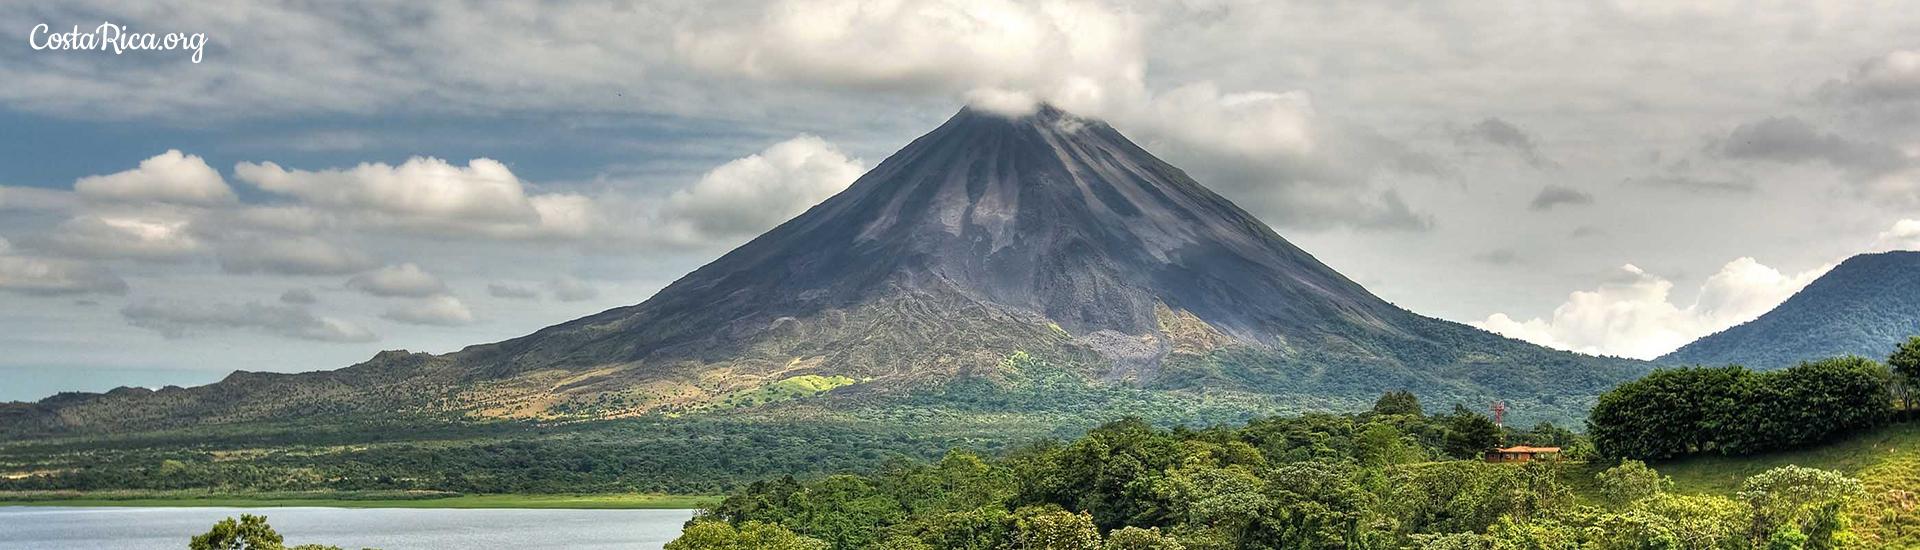 Costa Rica Geography